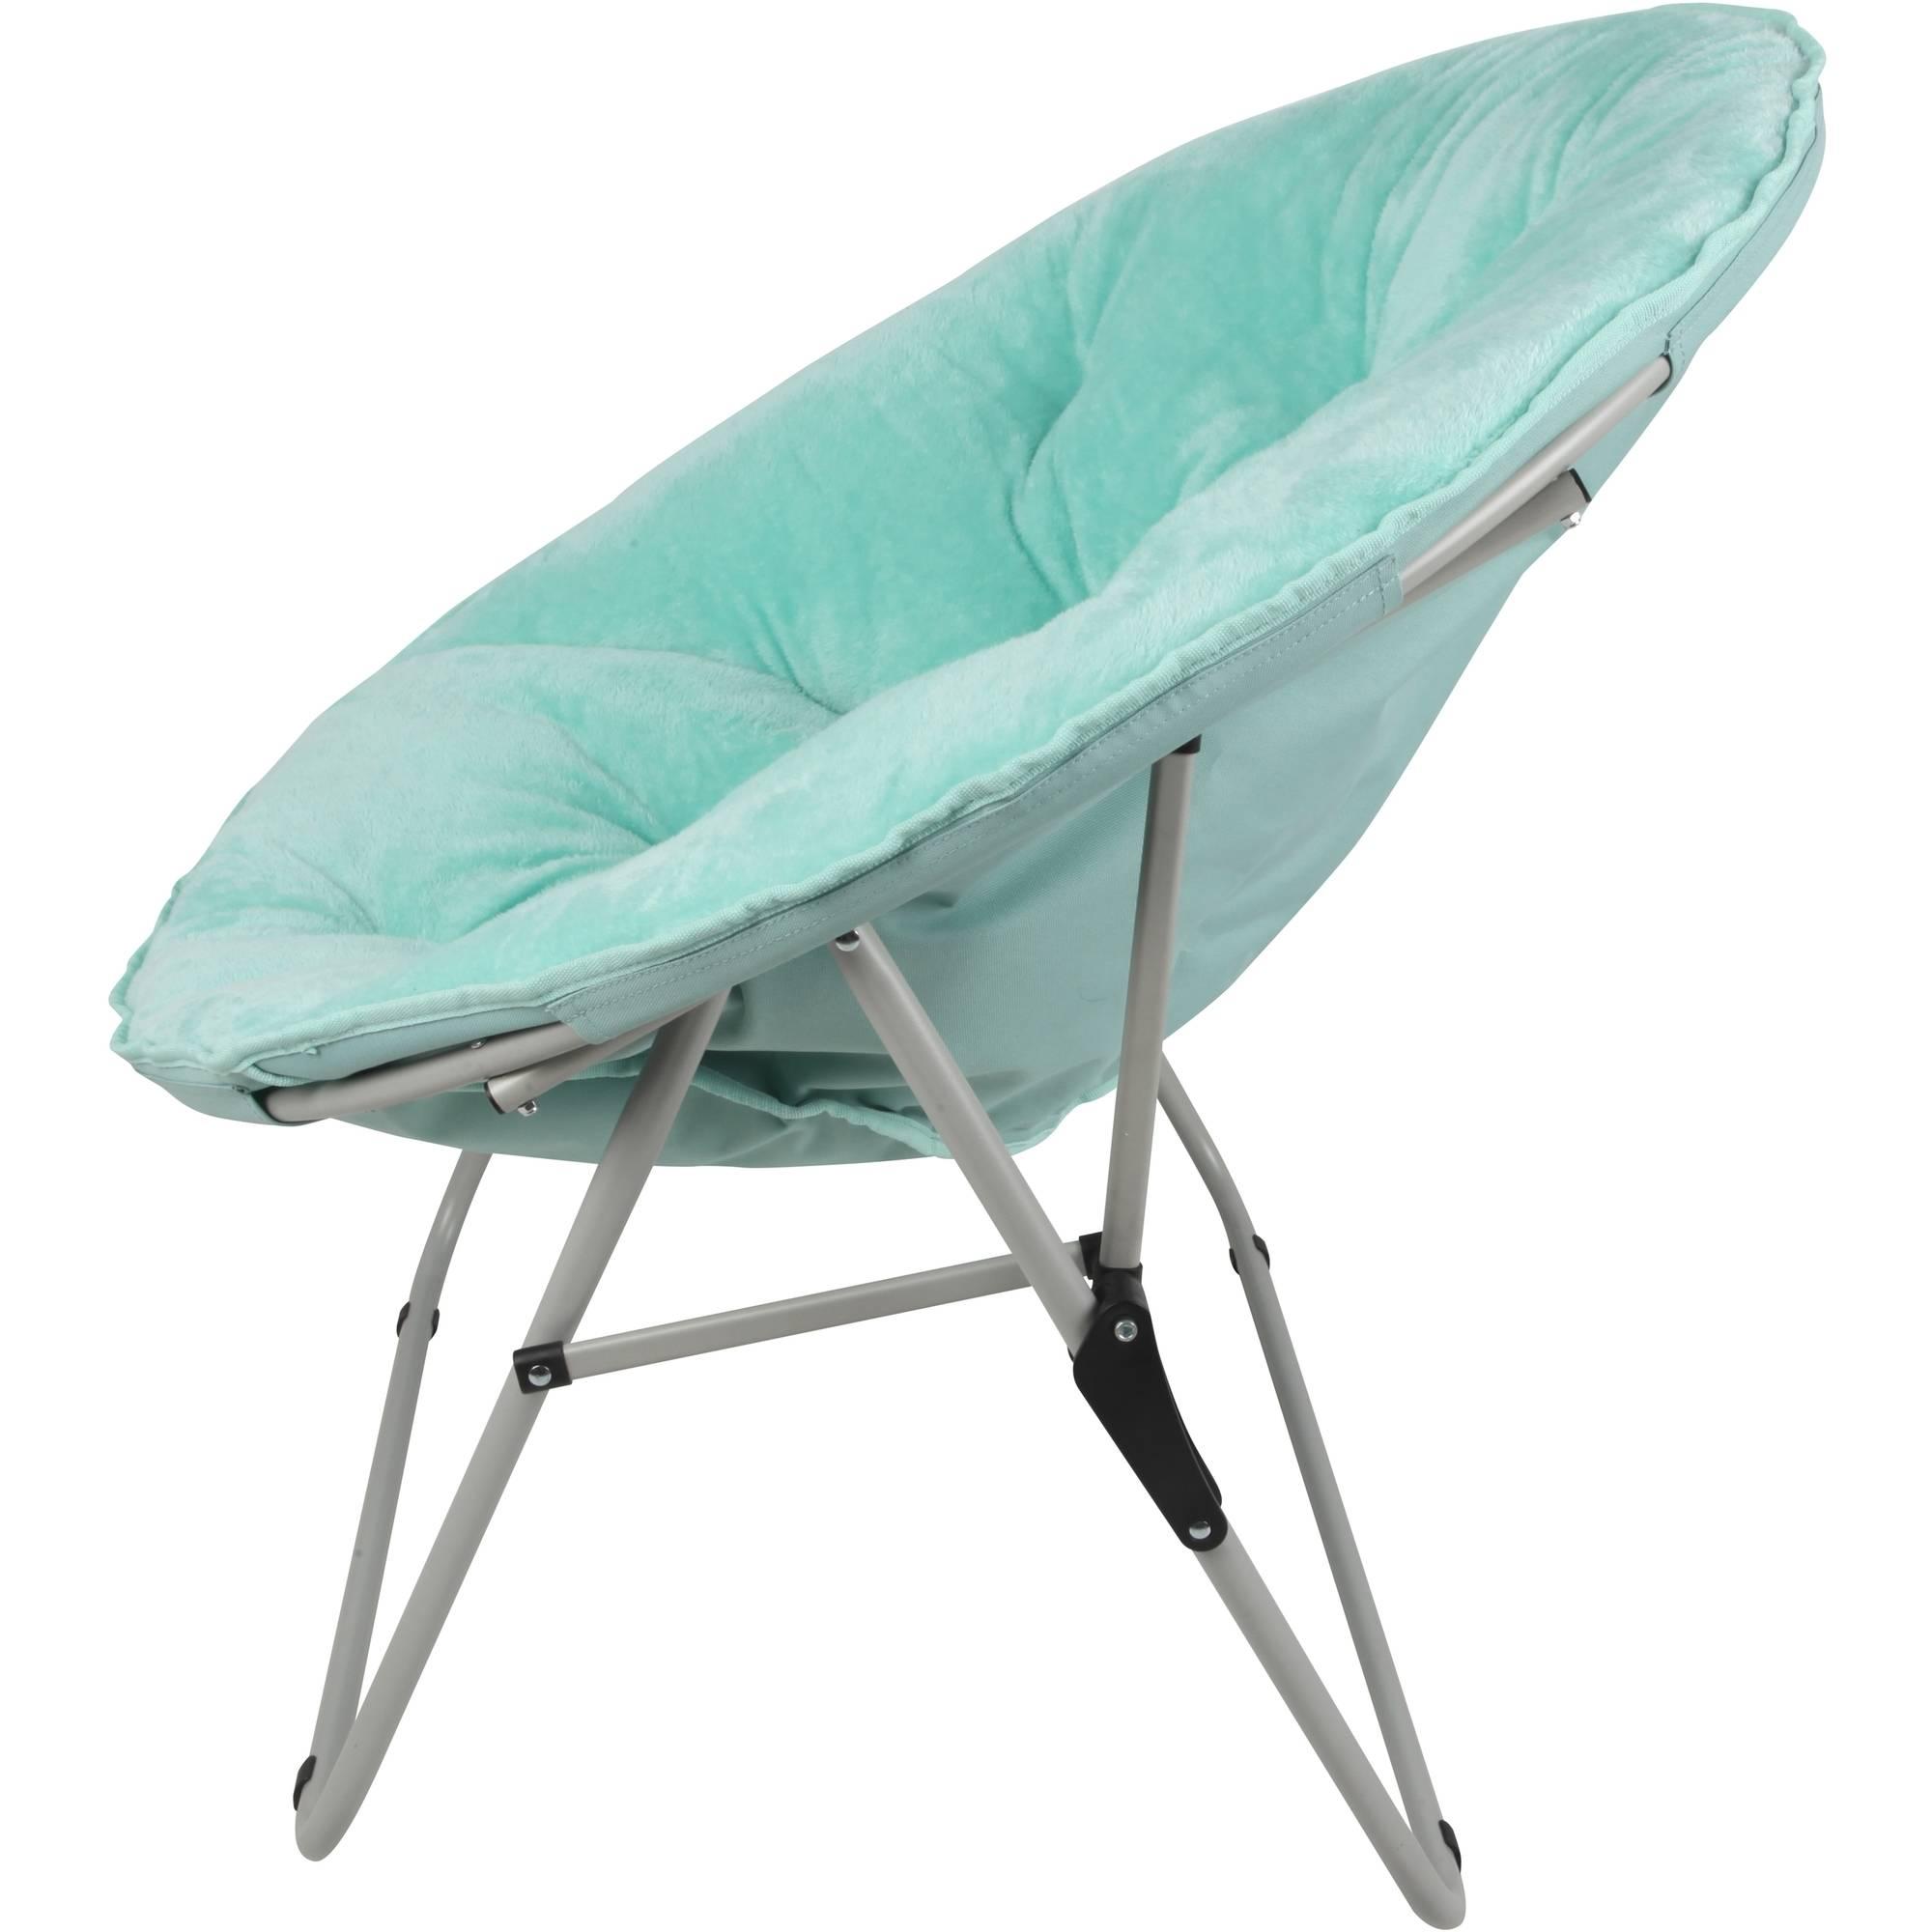 chair step stool ironing board dining covers velvet vtg jefferson bachelorus inone seat